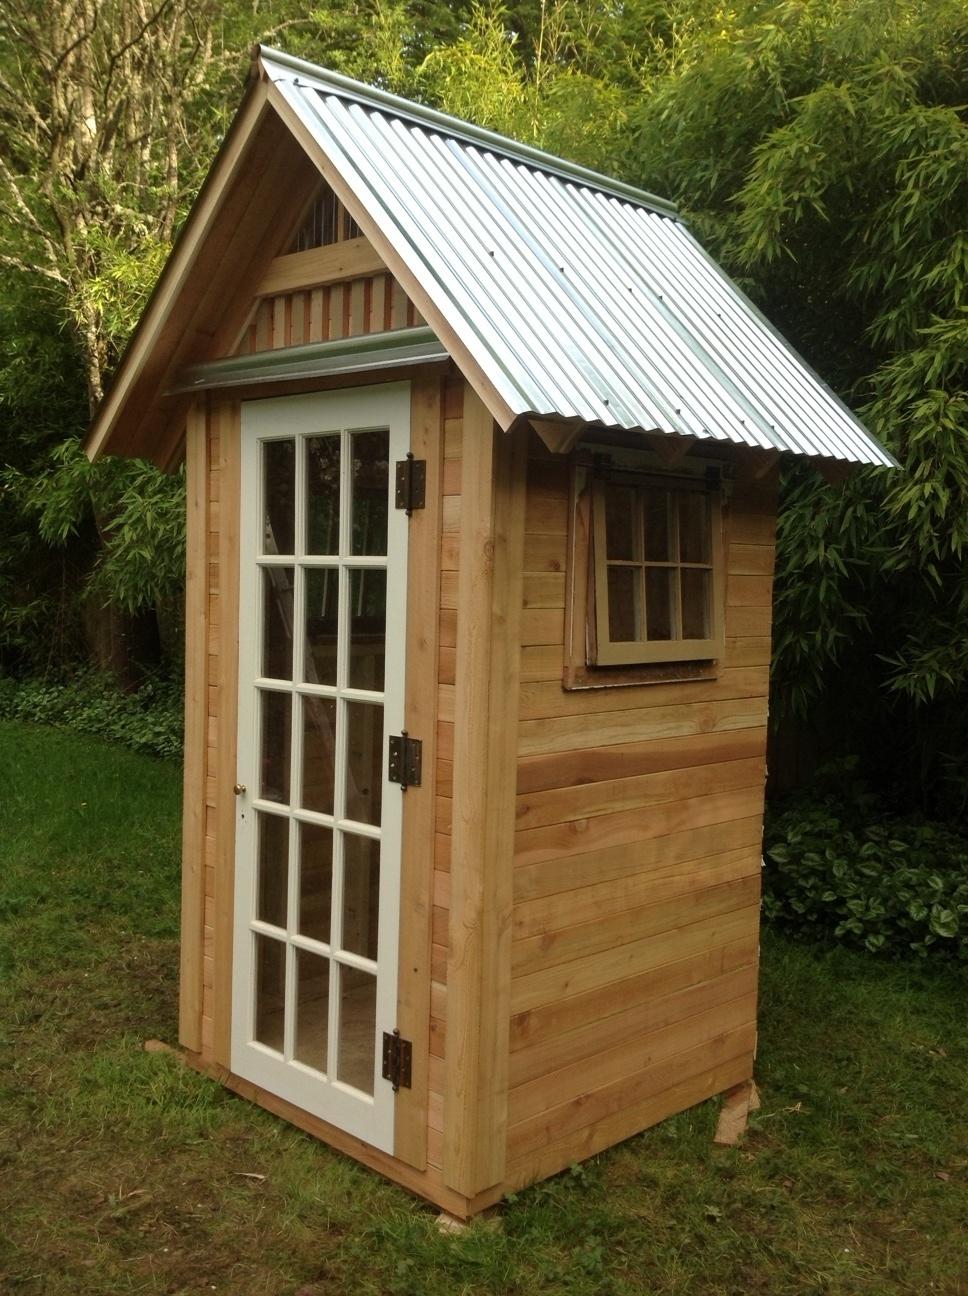 beautiful garden shed made from recycled materials victorian craftsmen bainbridge island handyman painting - Garden Sheds From Recycled Materials